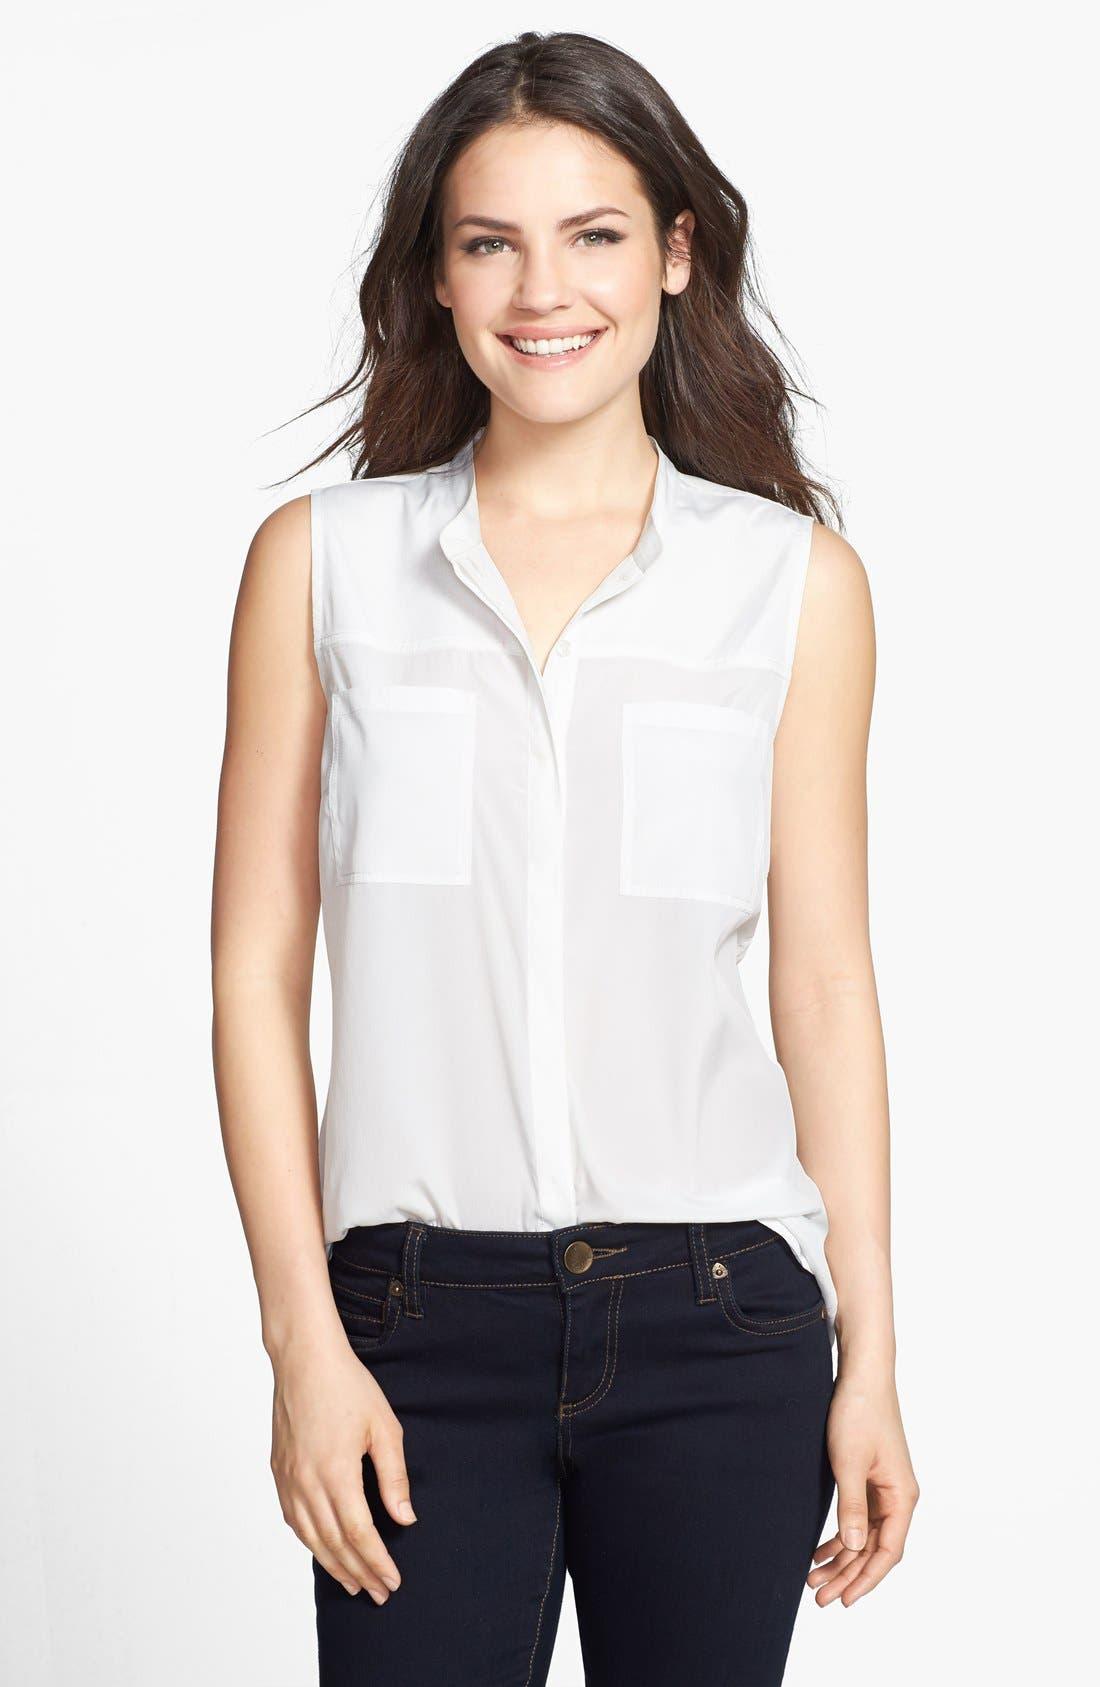 Alternate Image 1 Selected - Halogen® Banded Collar Sleeveless Blouse (Regular & Petite)